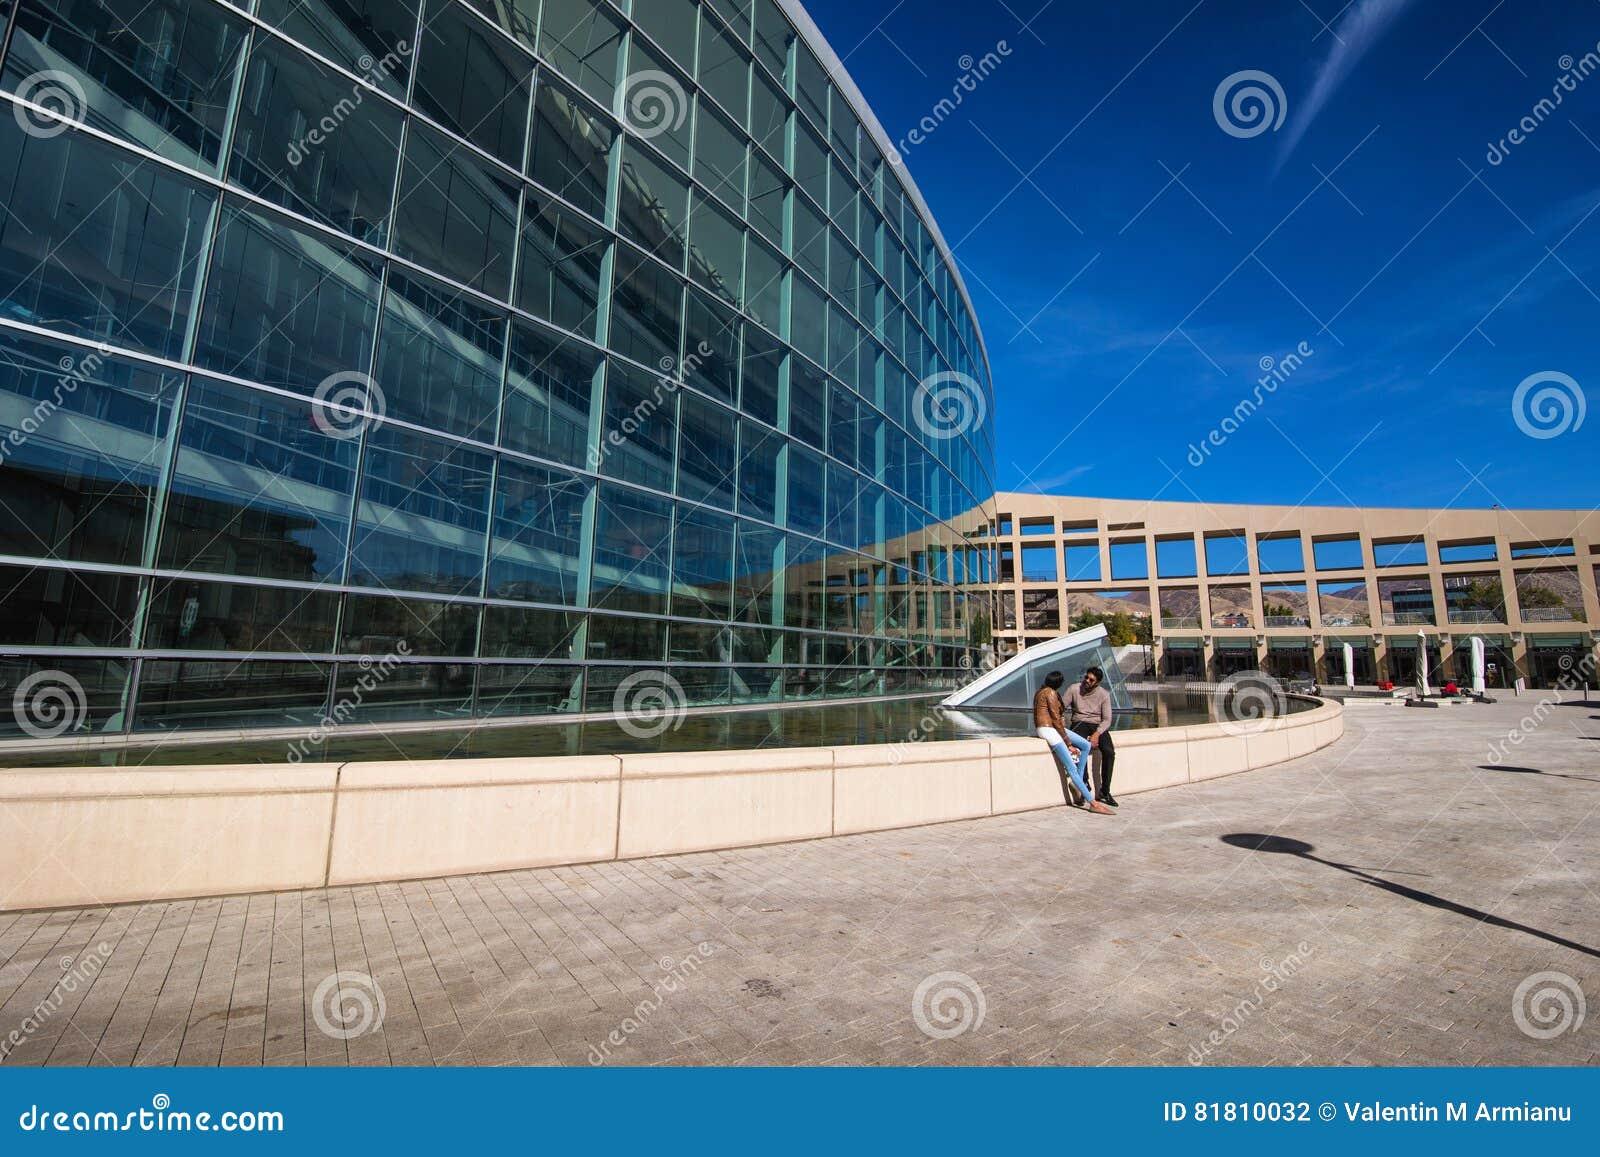 Salt Lake City Police Department Building